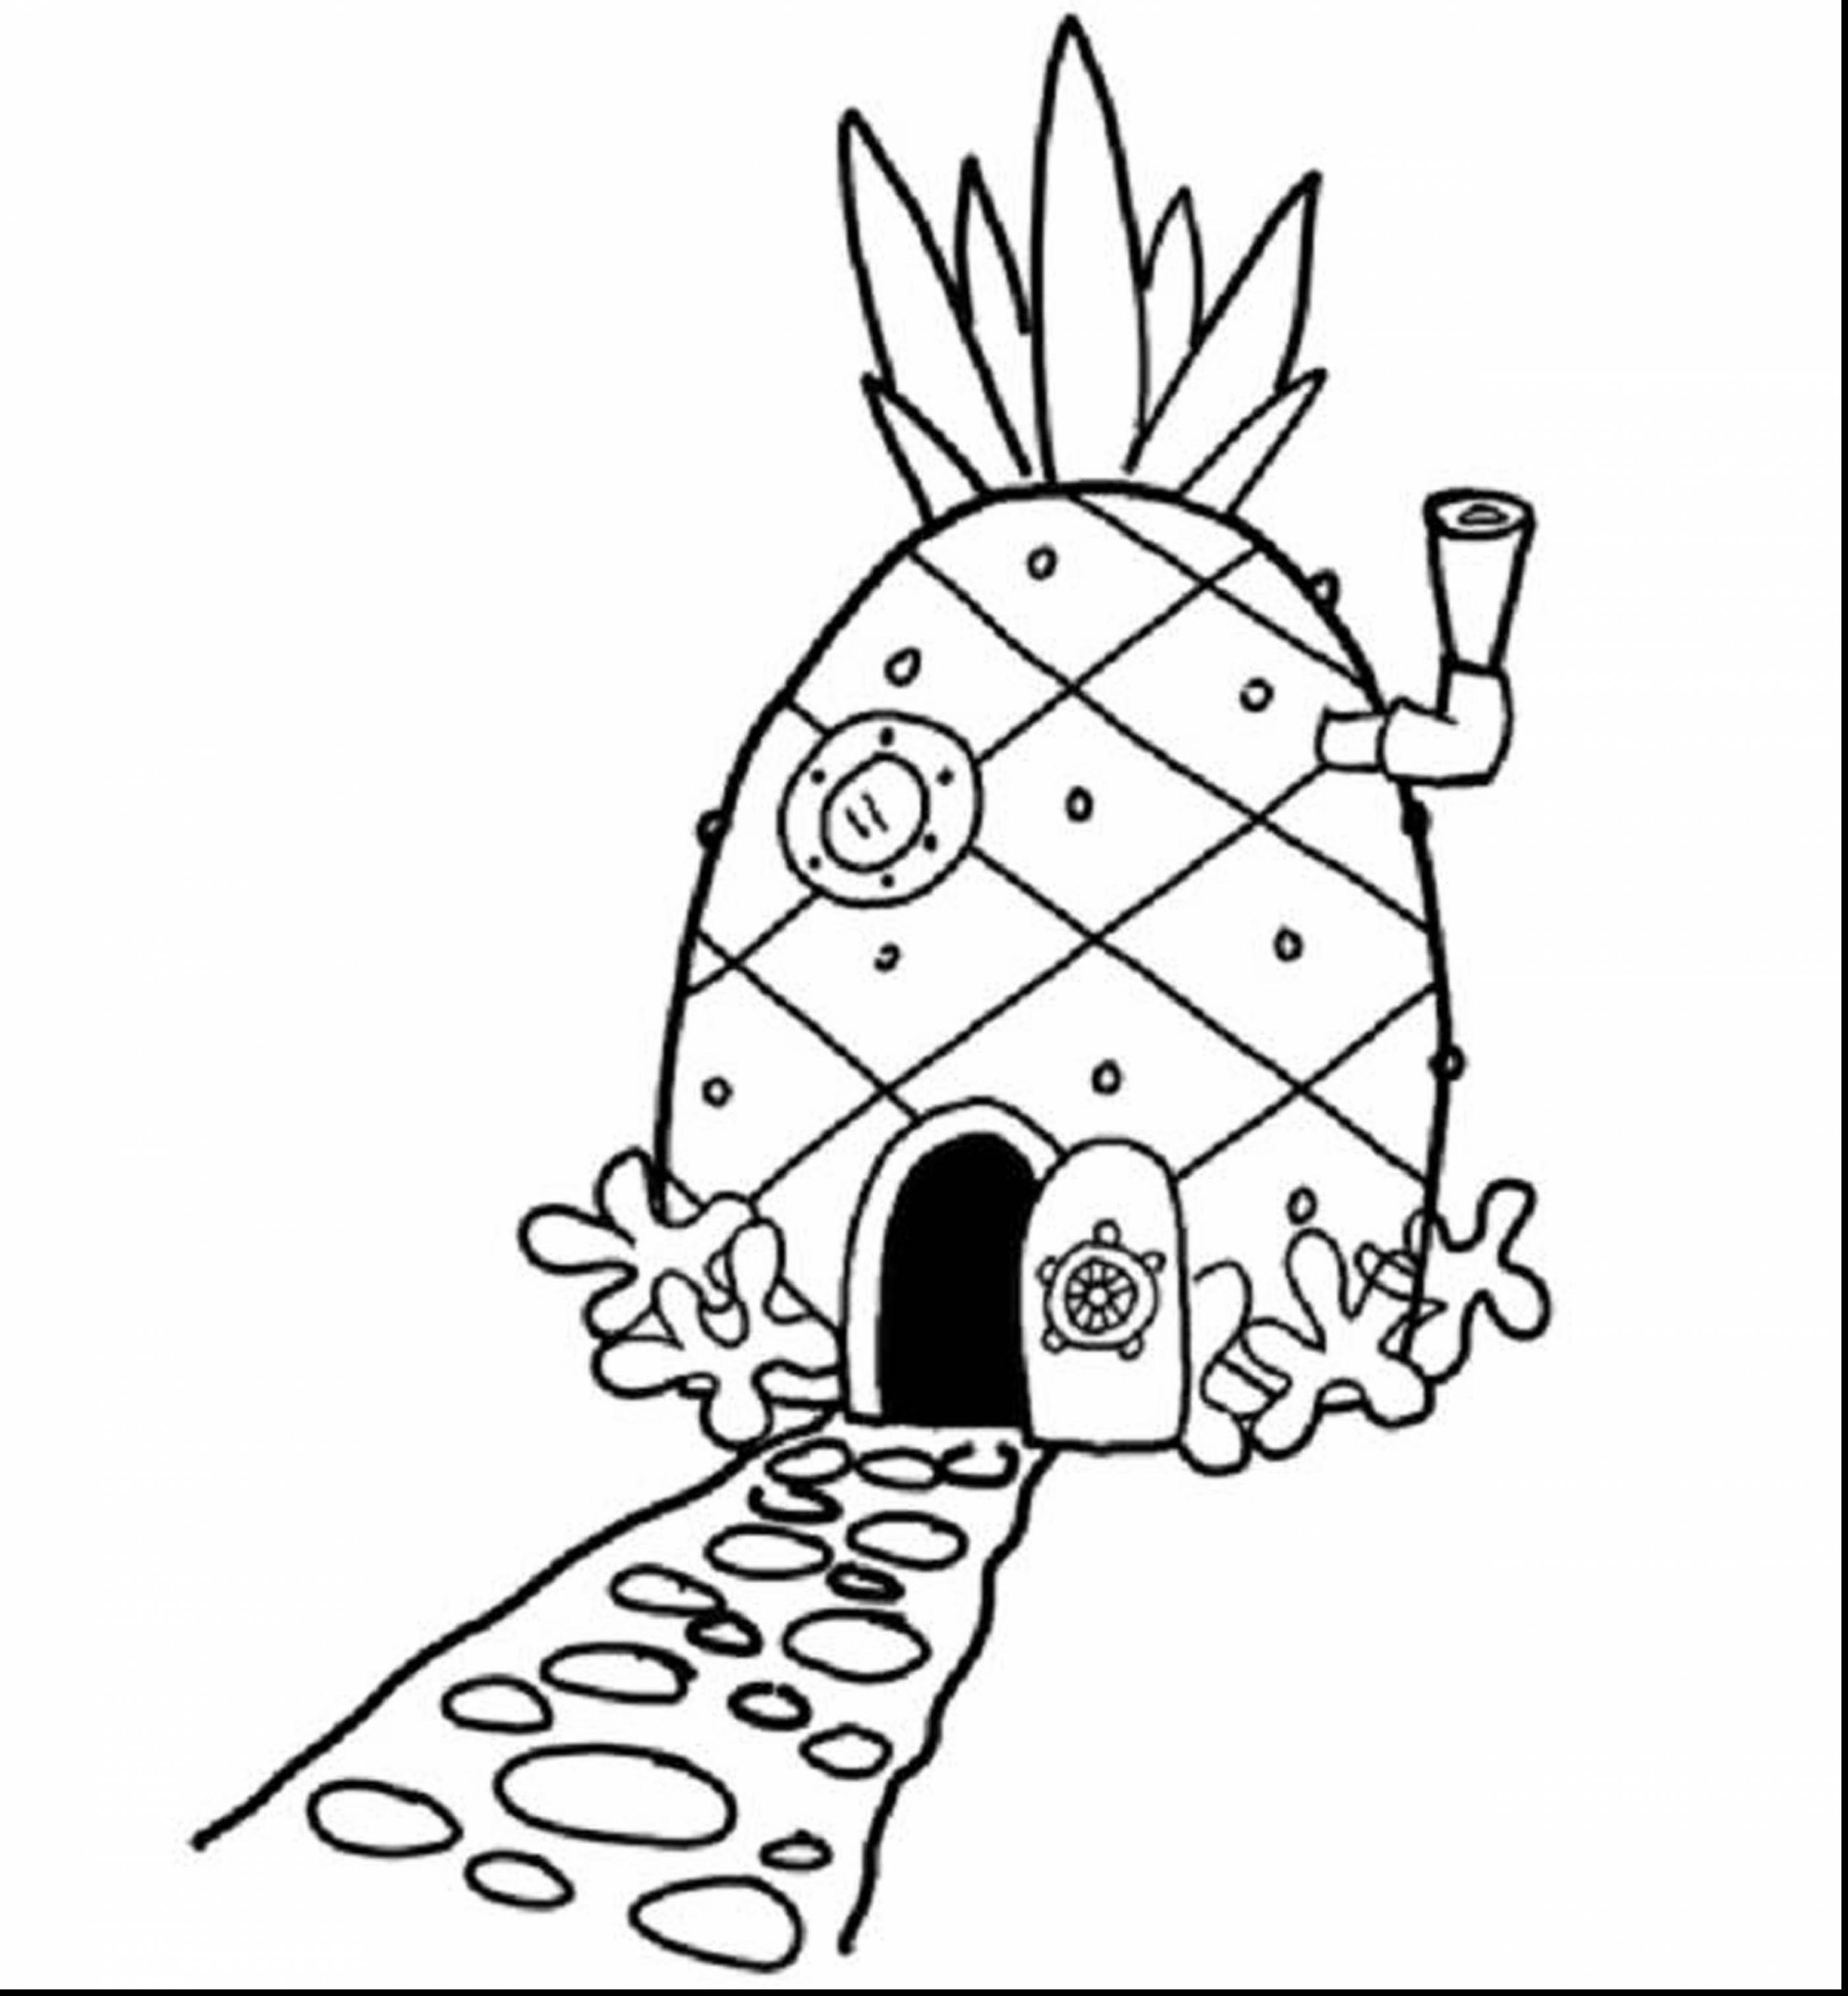 Spongebob And Patrick Drawing At Getdrawings